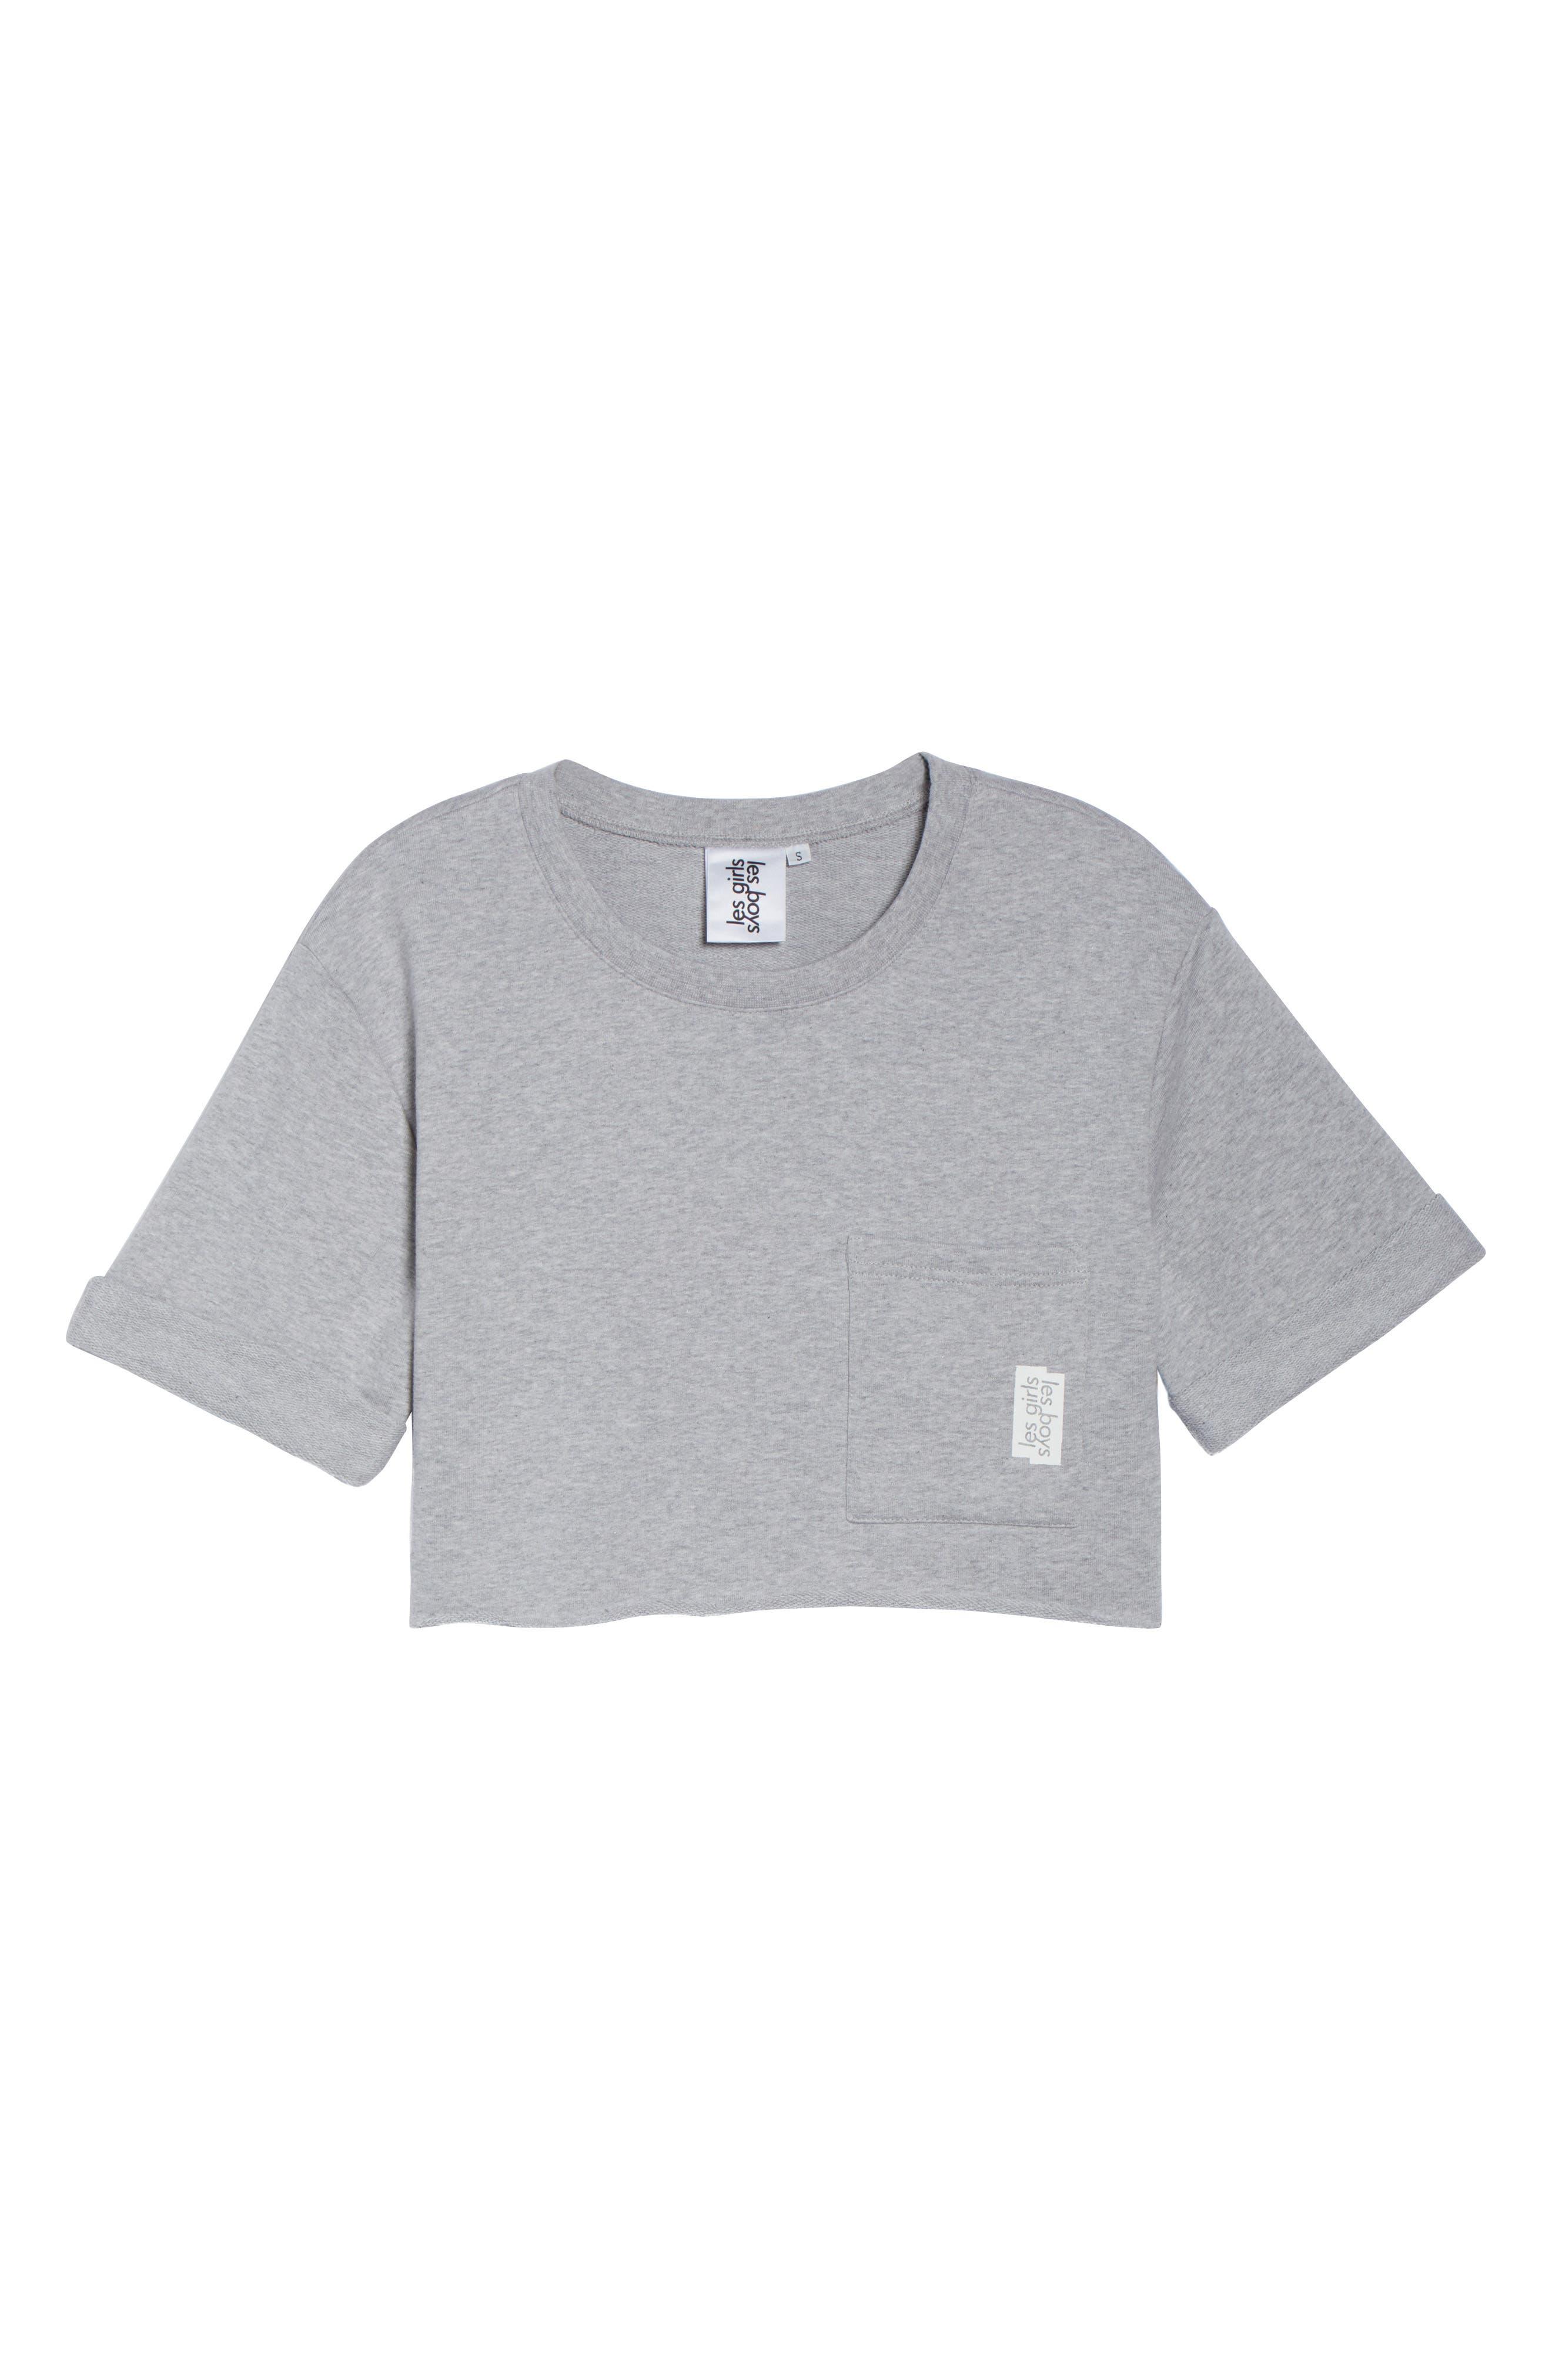 French Terry Crop Sweatshirt,                             Alternate thumbnail 5, color,                             Light Grey Marl